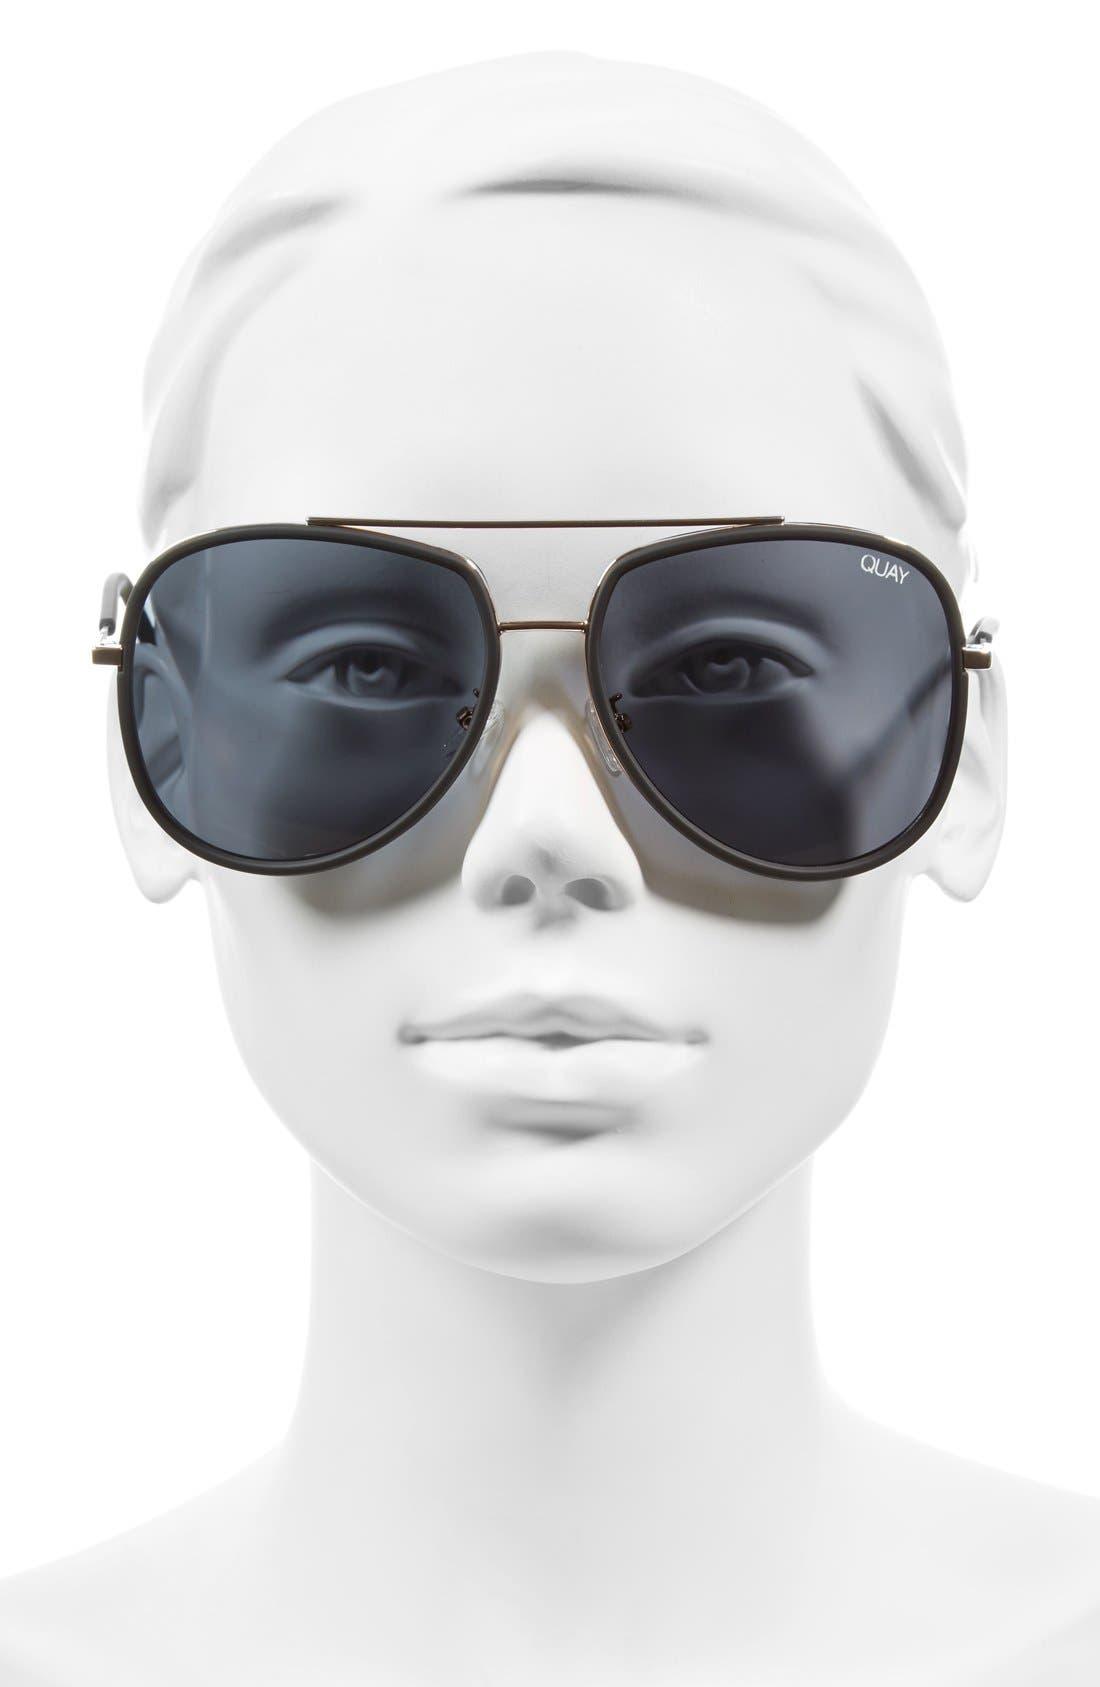 QUAY AUSTRALIA 'Needing Fame' 65mm Aviator Sunglasses, Main, color, BLACK/ SMOKE